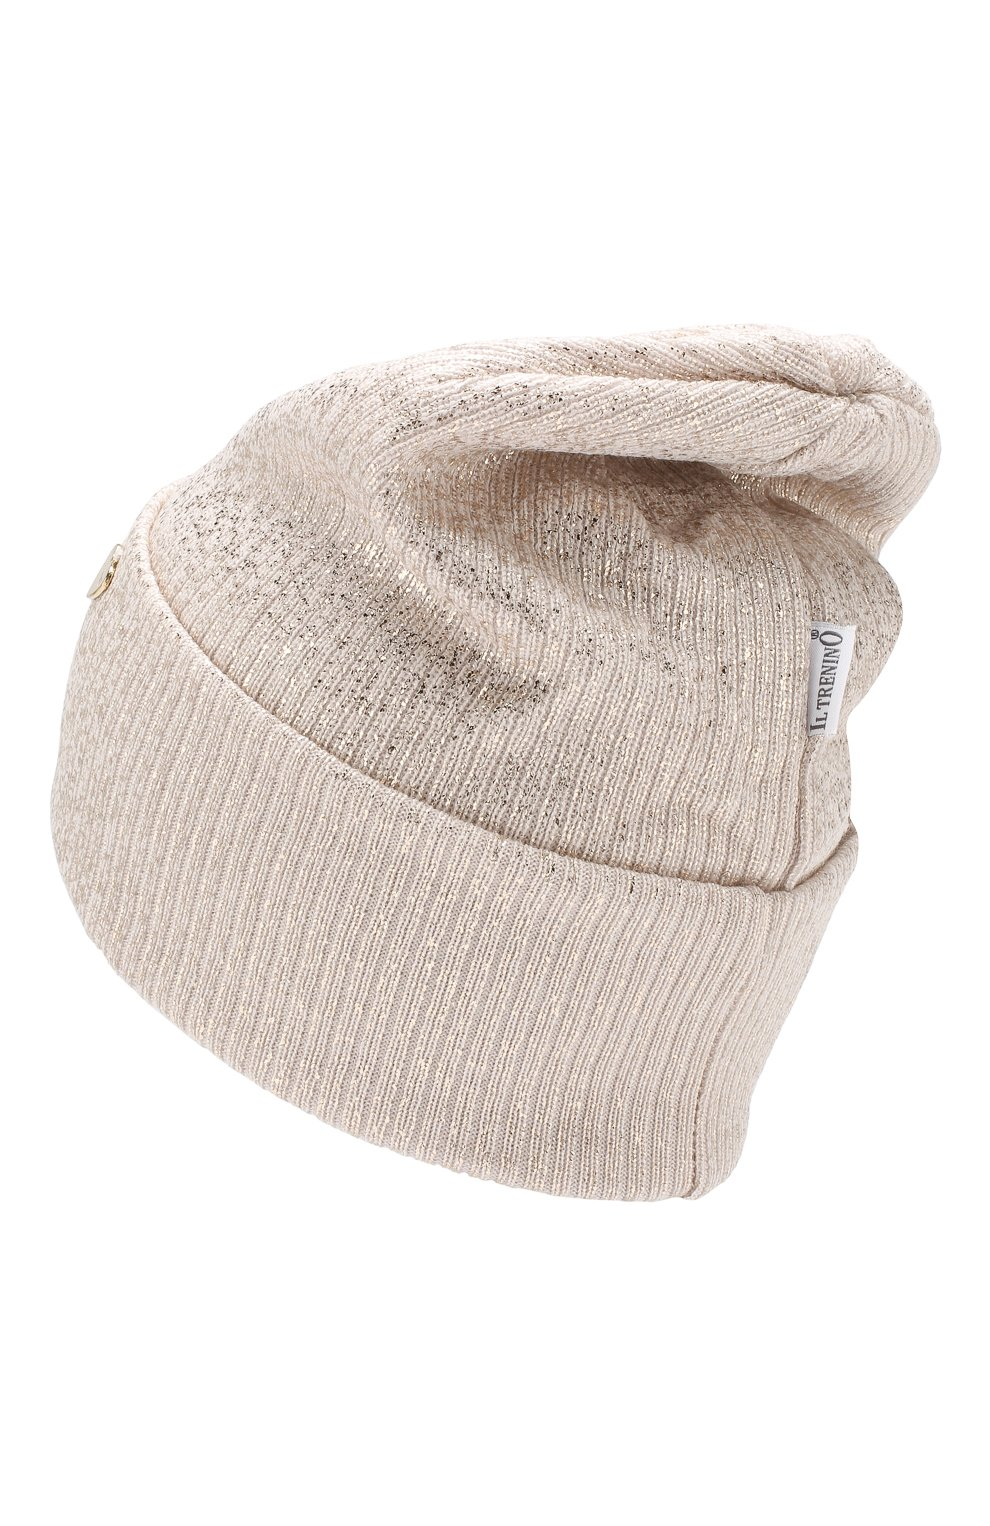 Детского шерстяная шапка IL TRENINO бежевого цвета, арт. 19 5961/E0 | Фото 2